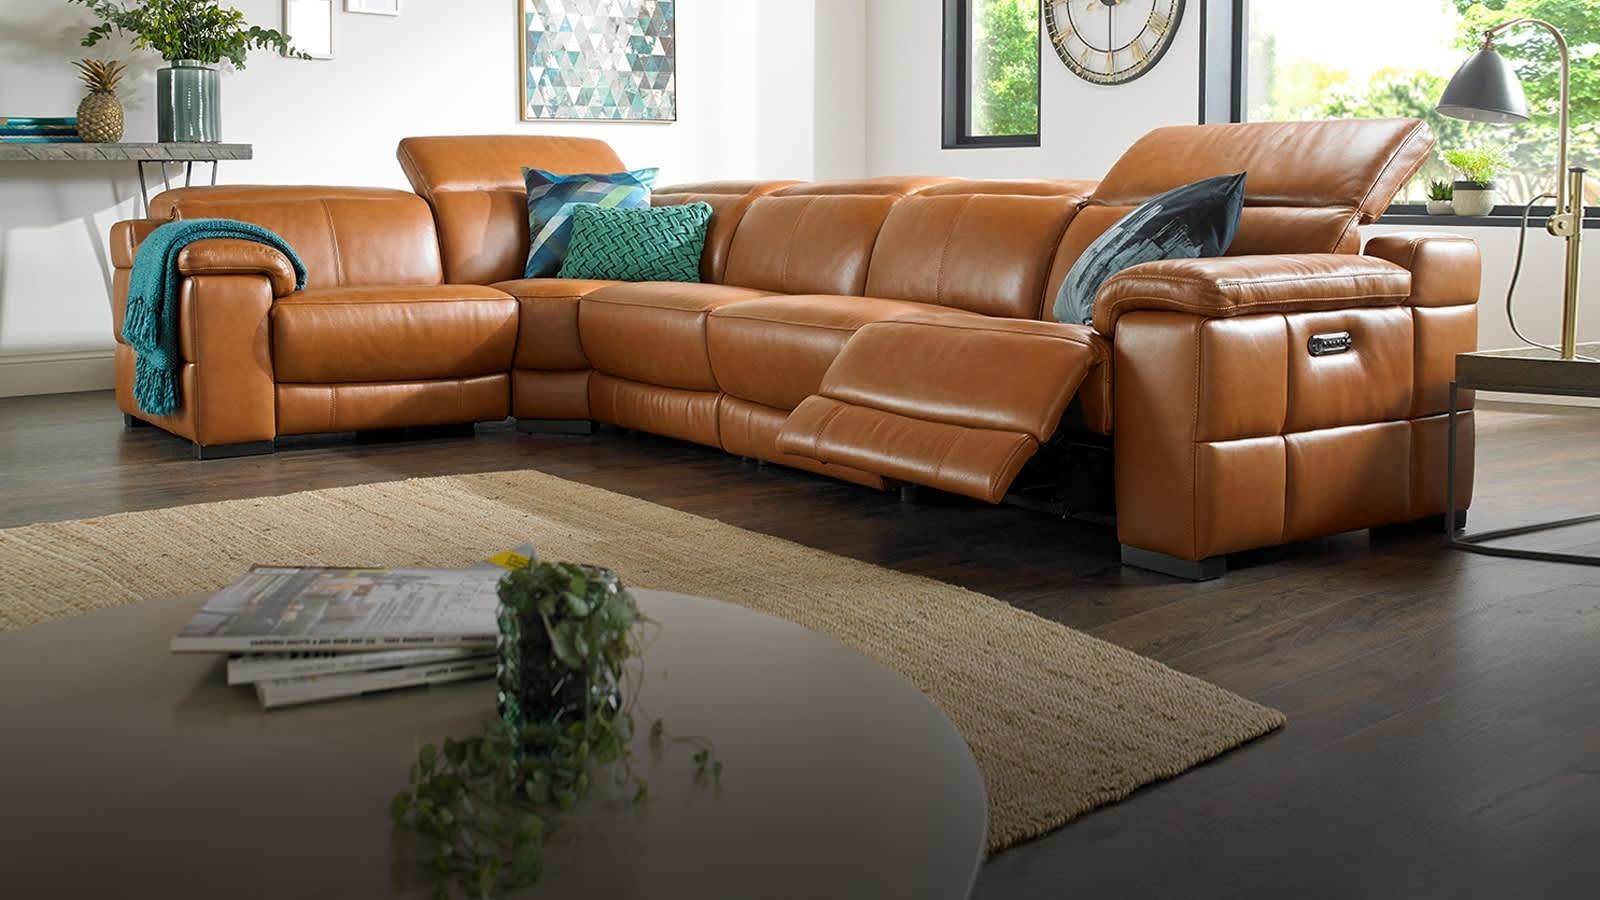 Corner Sofas In Leather, Fabric